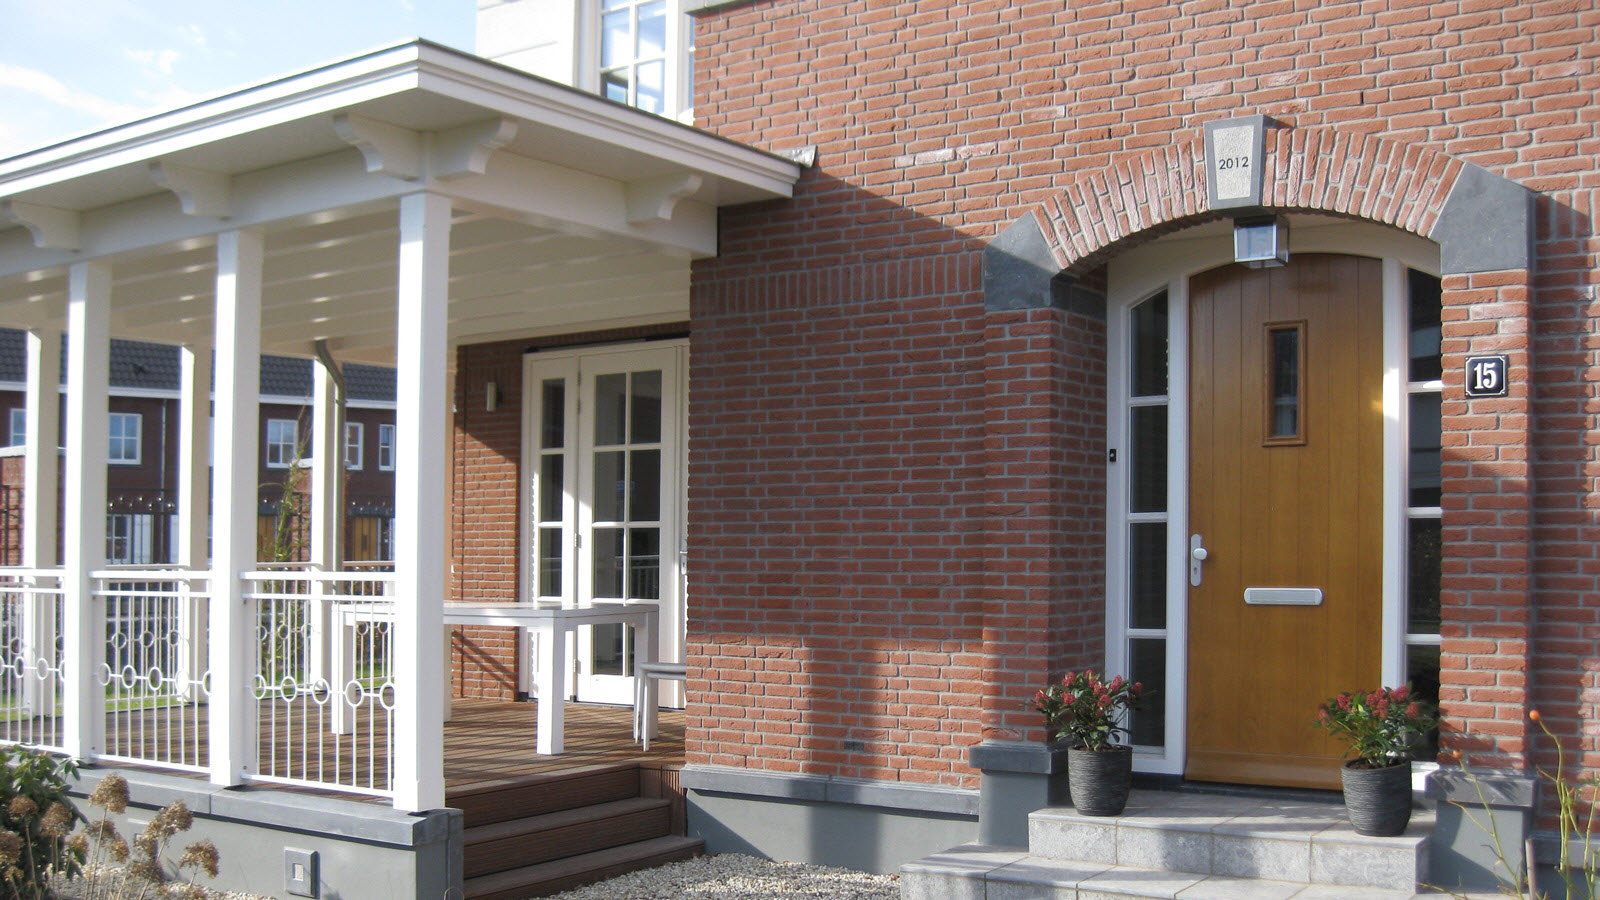 Parkhagen Sint Michielsgestel (3)